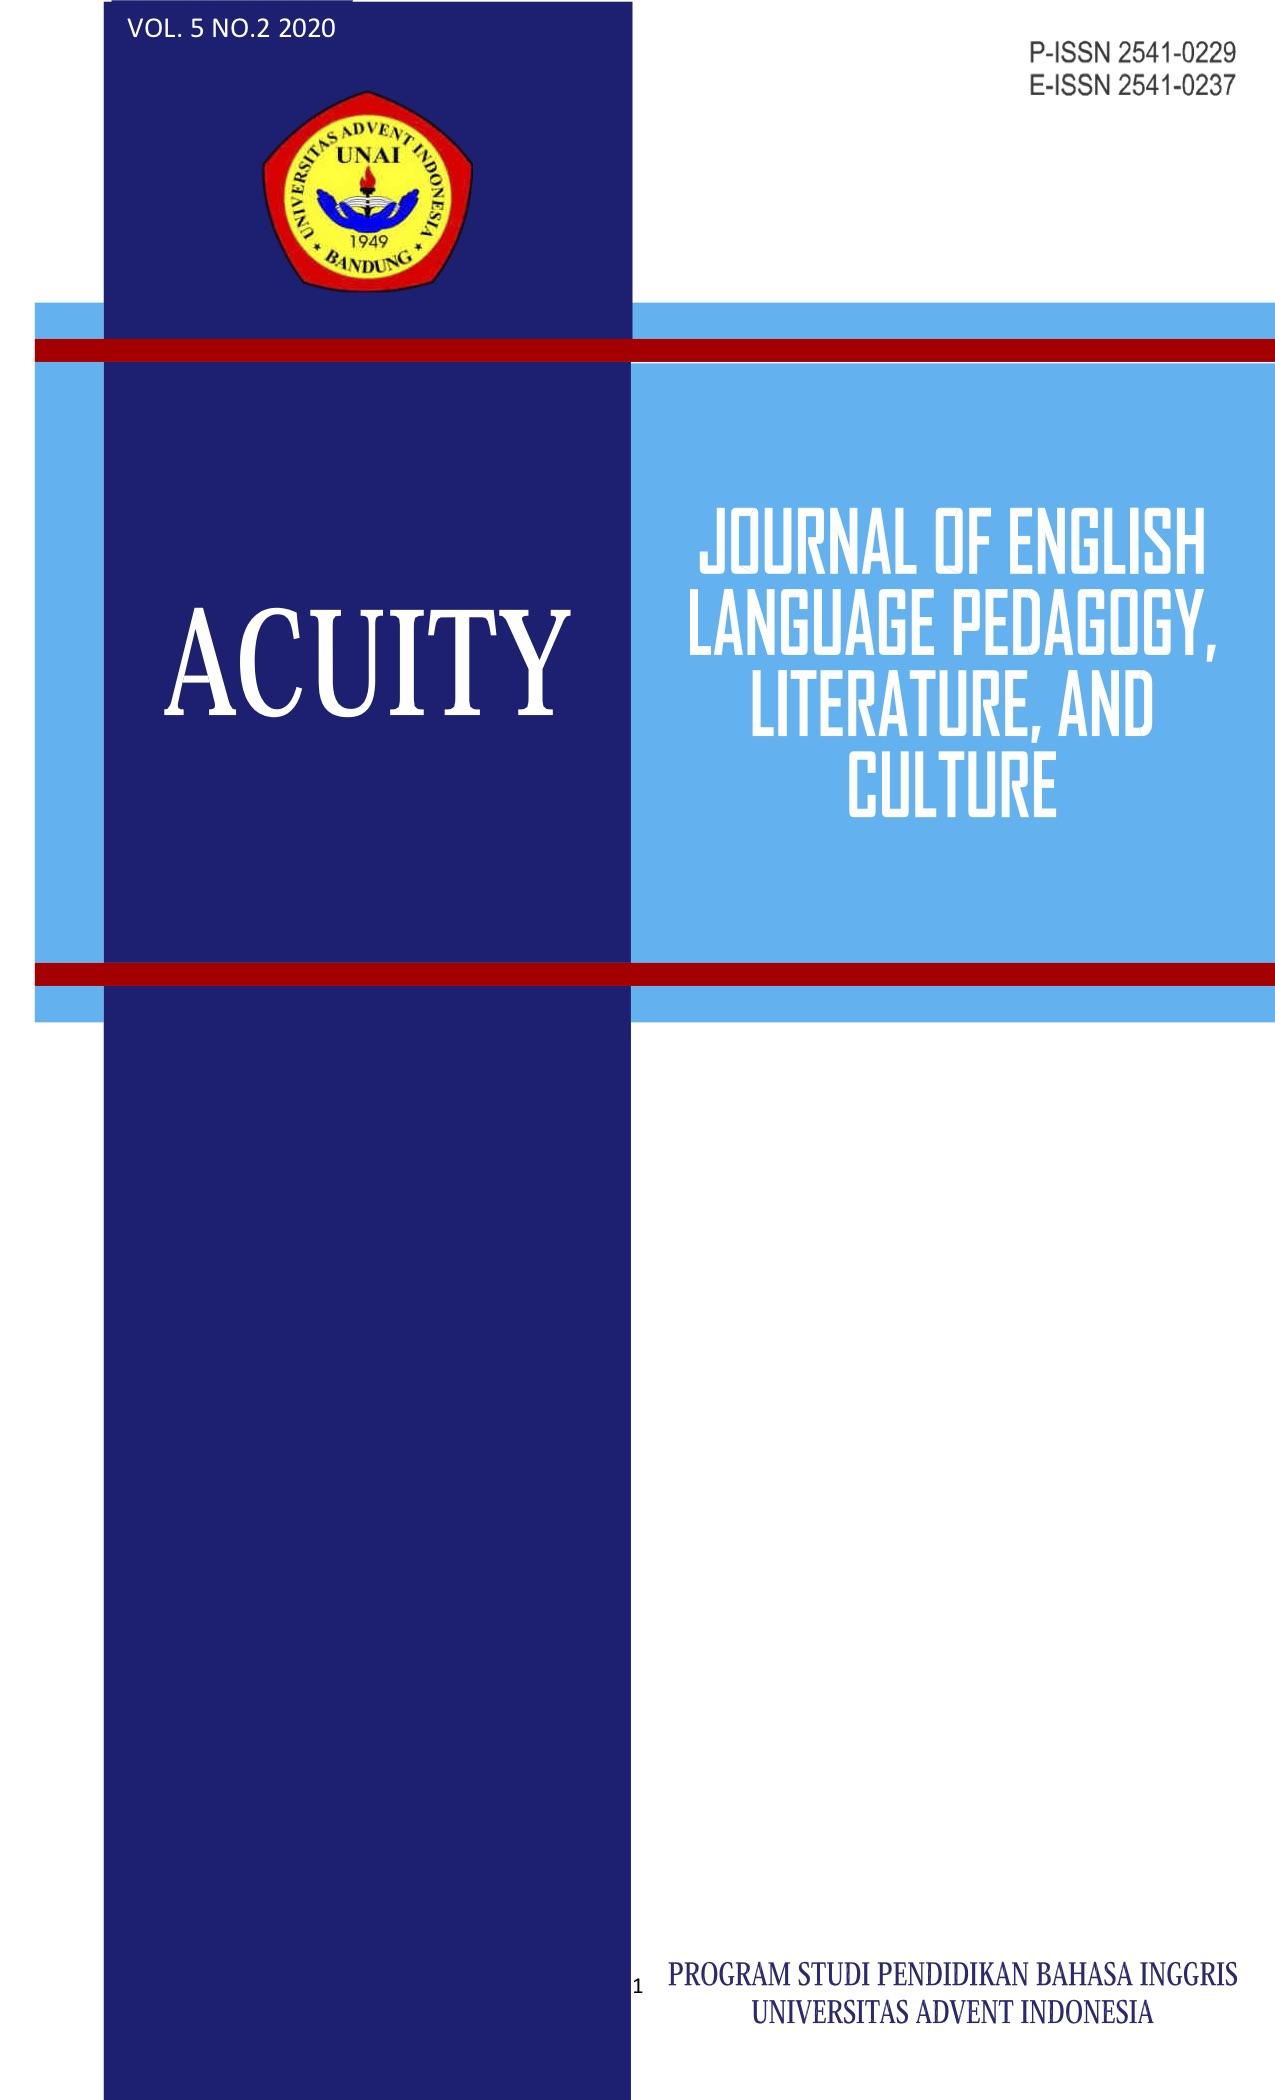 View Vol. 5 No. 2 (2020): Acuity: Journal of English Langauge Pedagogy, Literature & Culture